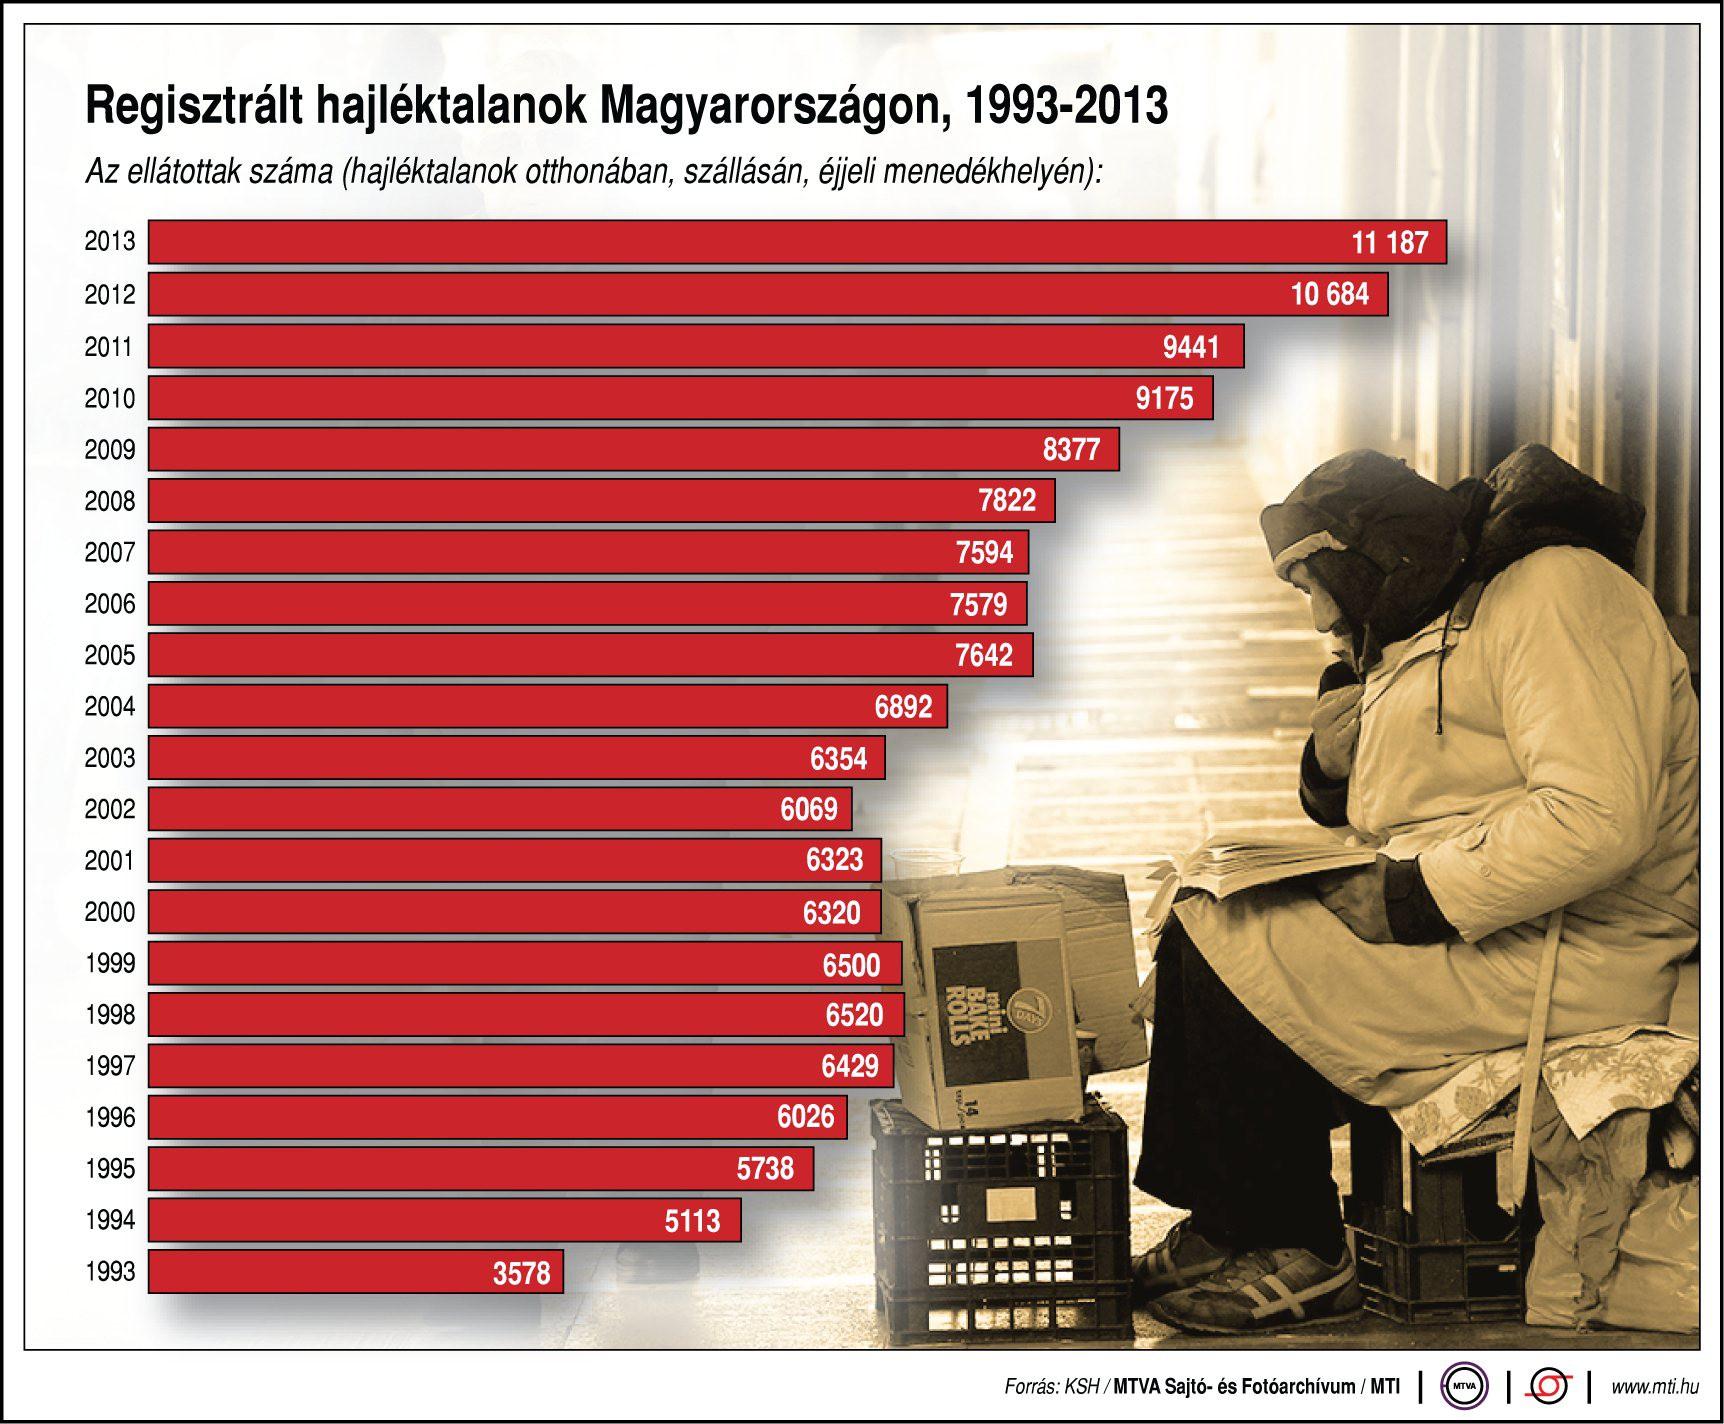 hajlektalanok-magyarorszagon-statisztika.jpg